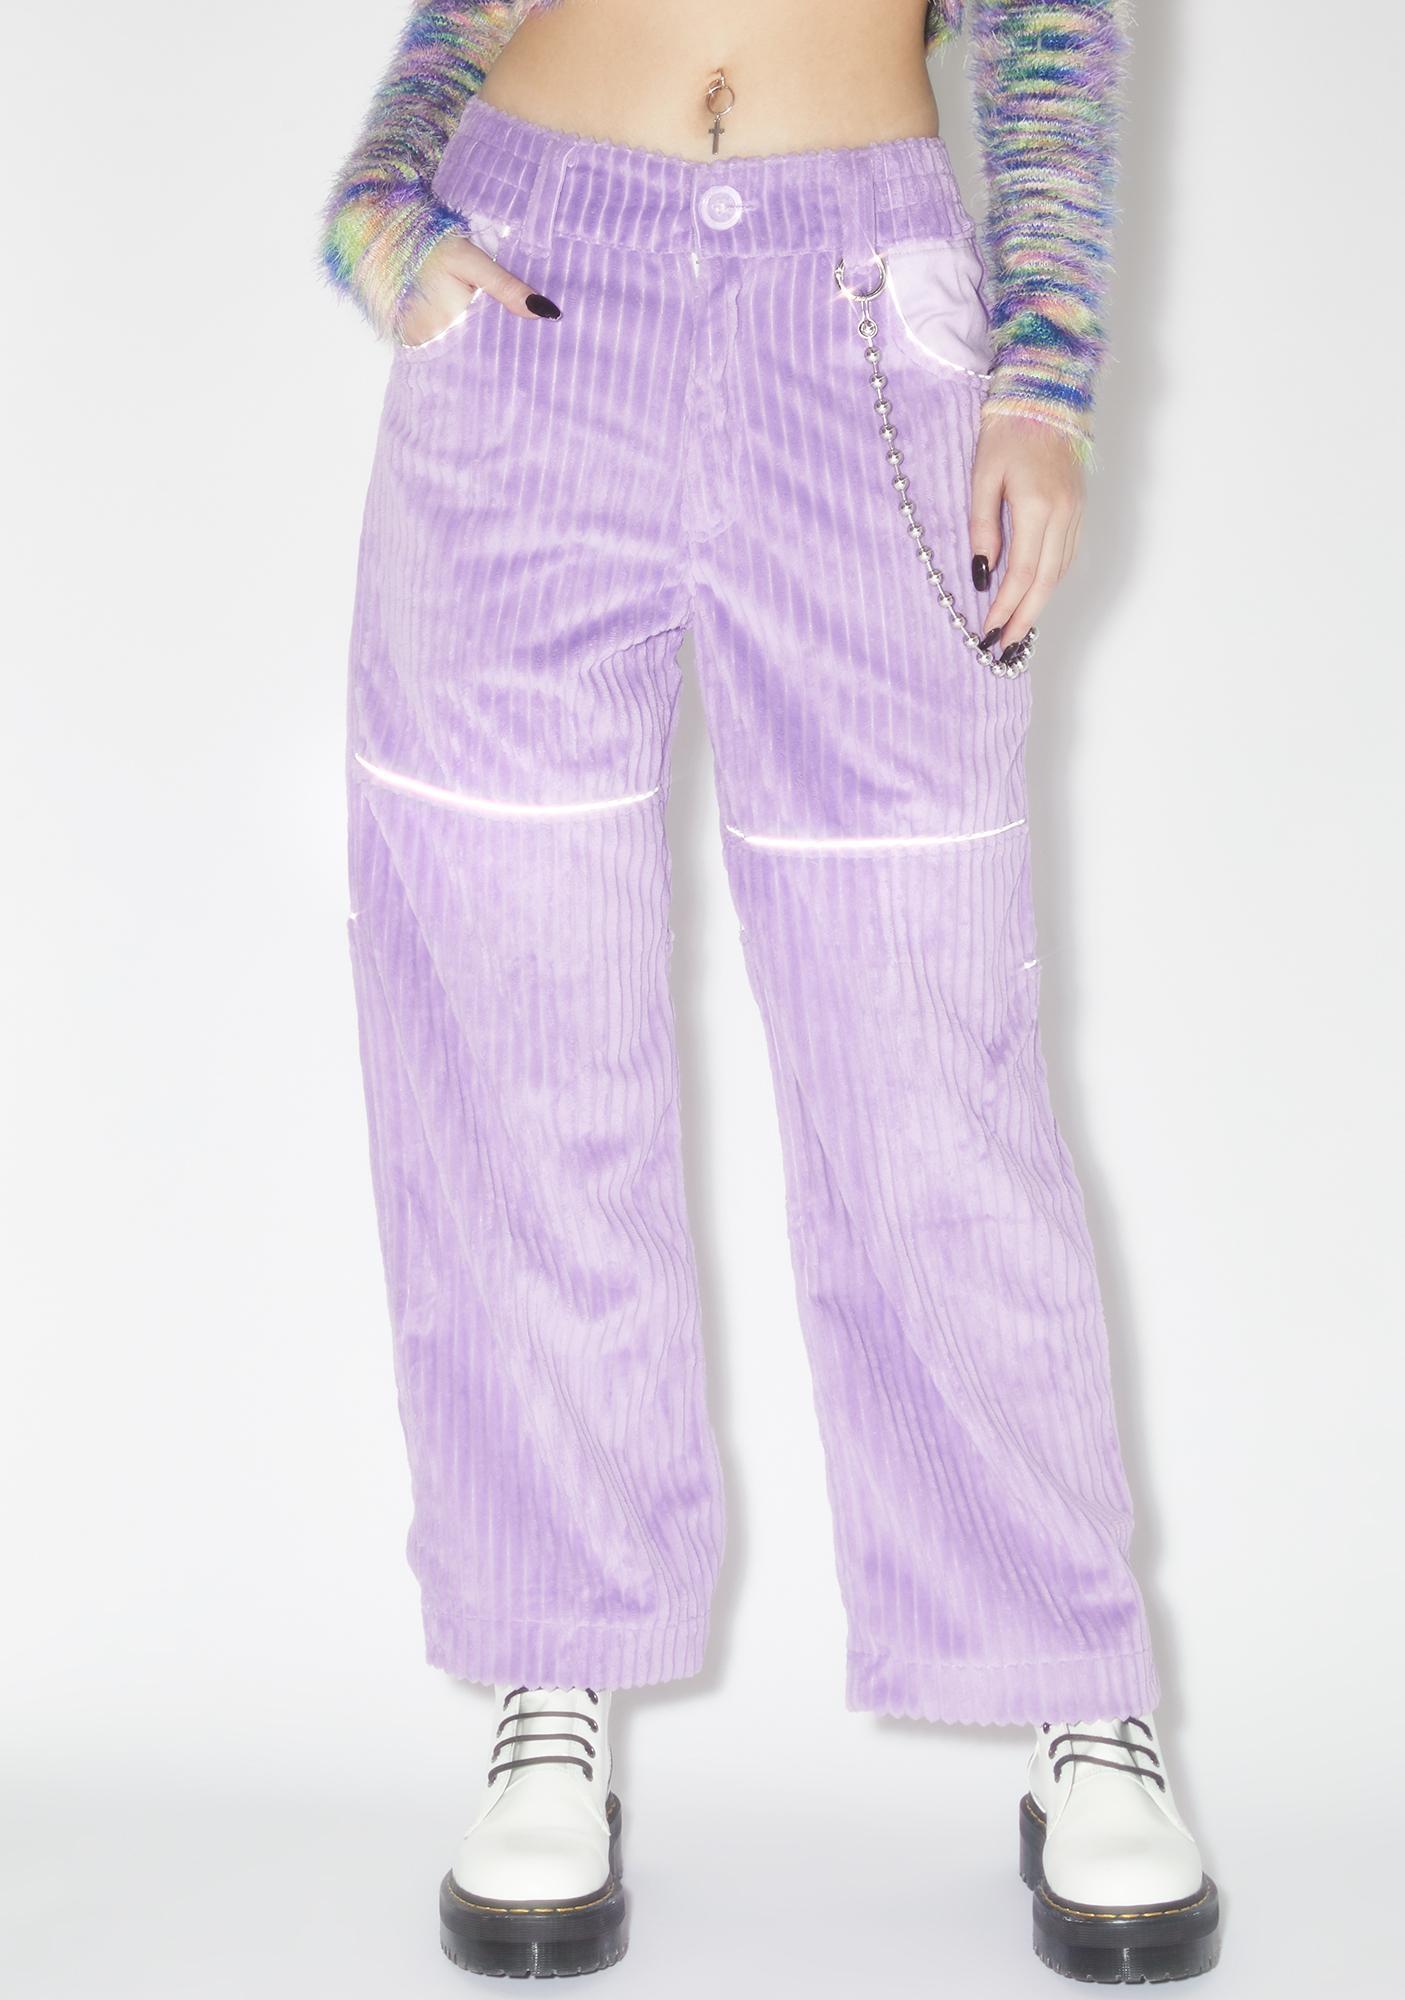 Somewhere Nowhere Lilac Corduroy Pants V.2